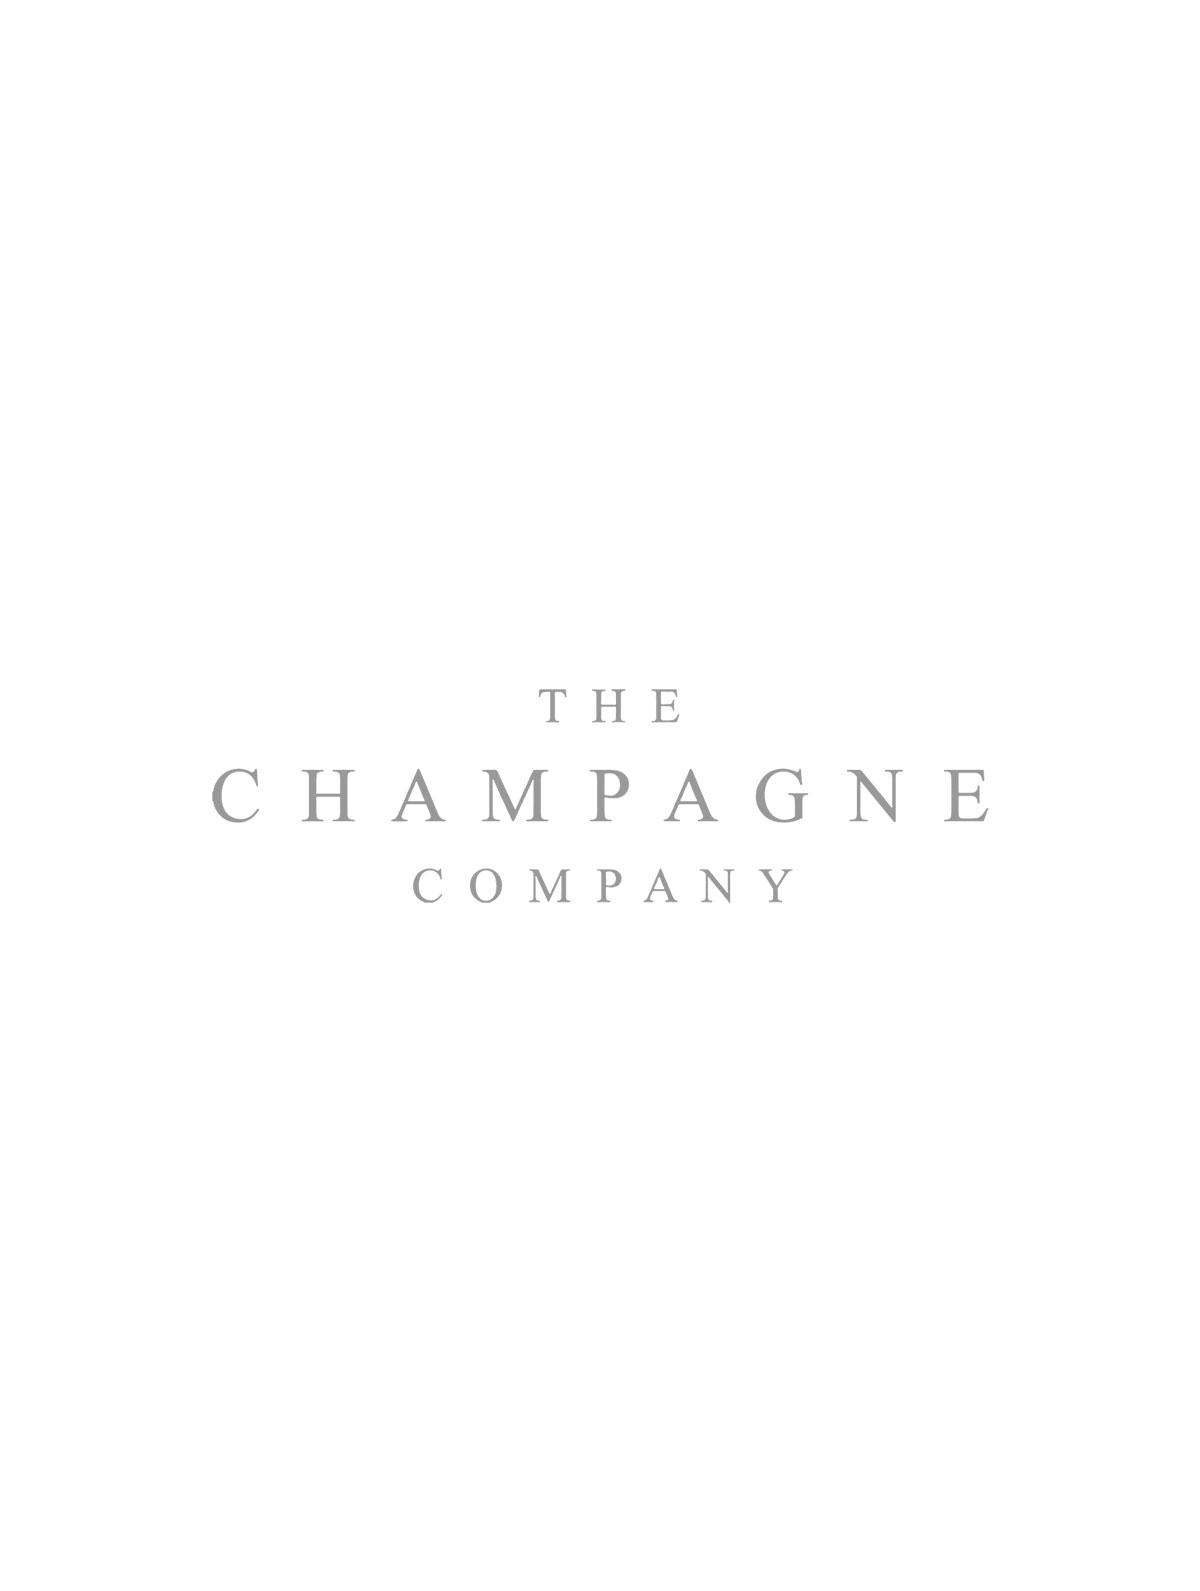 Drylands Riesling 2012 Marlborough New Zealand White Wine